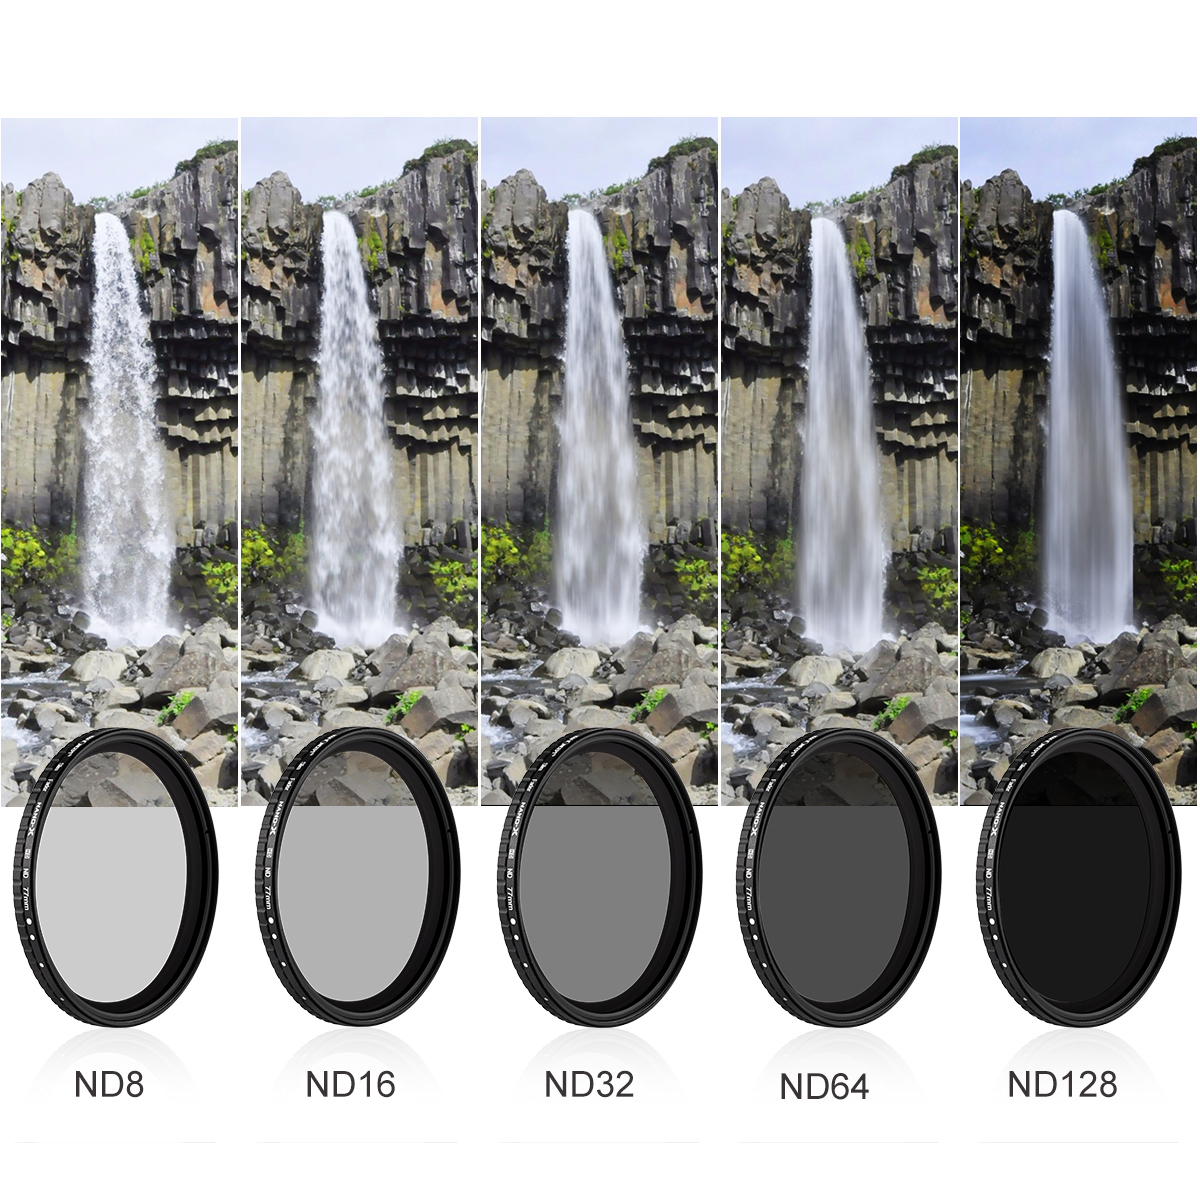 K&F Concept NANO-X バリアブル(可変式)NDフィルター Xムラ制御タイプ 減光範囲 ND8 - ND128 KF-NDX8-128